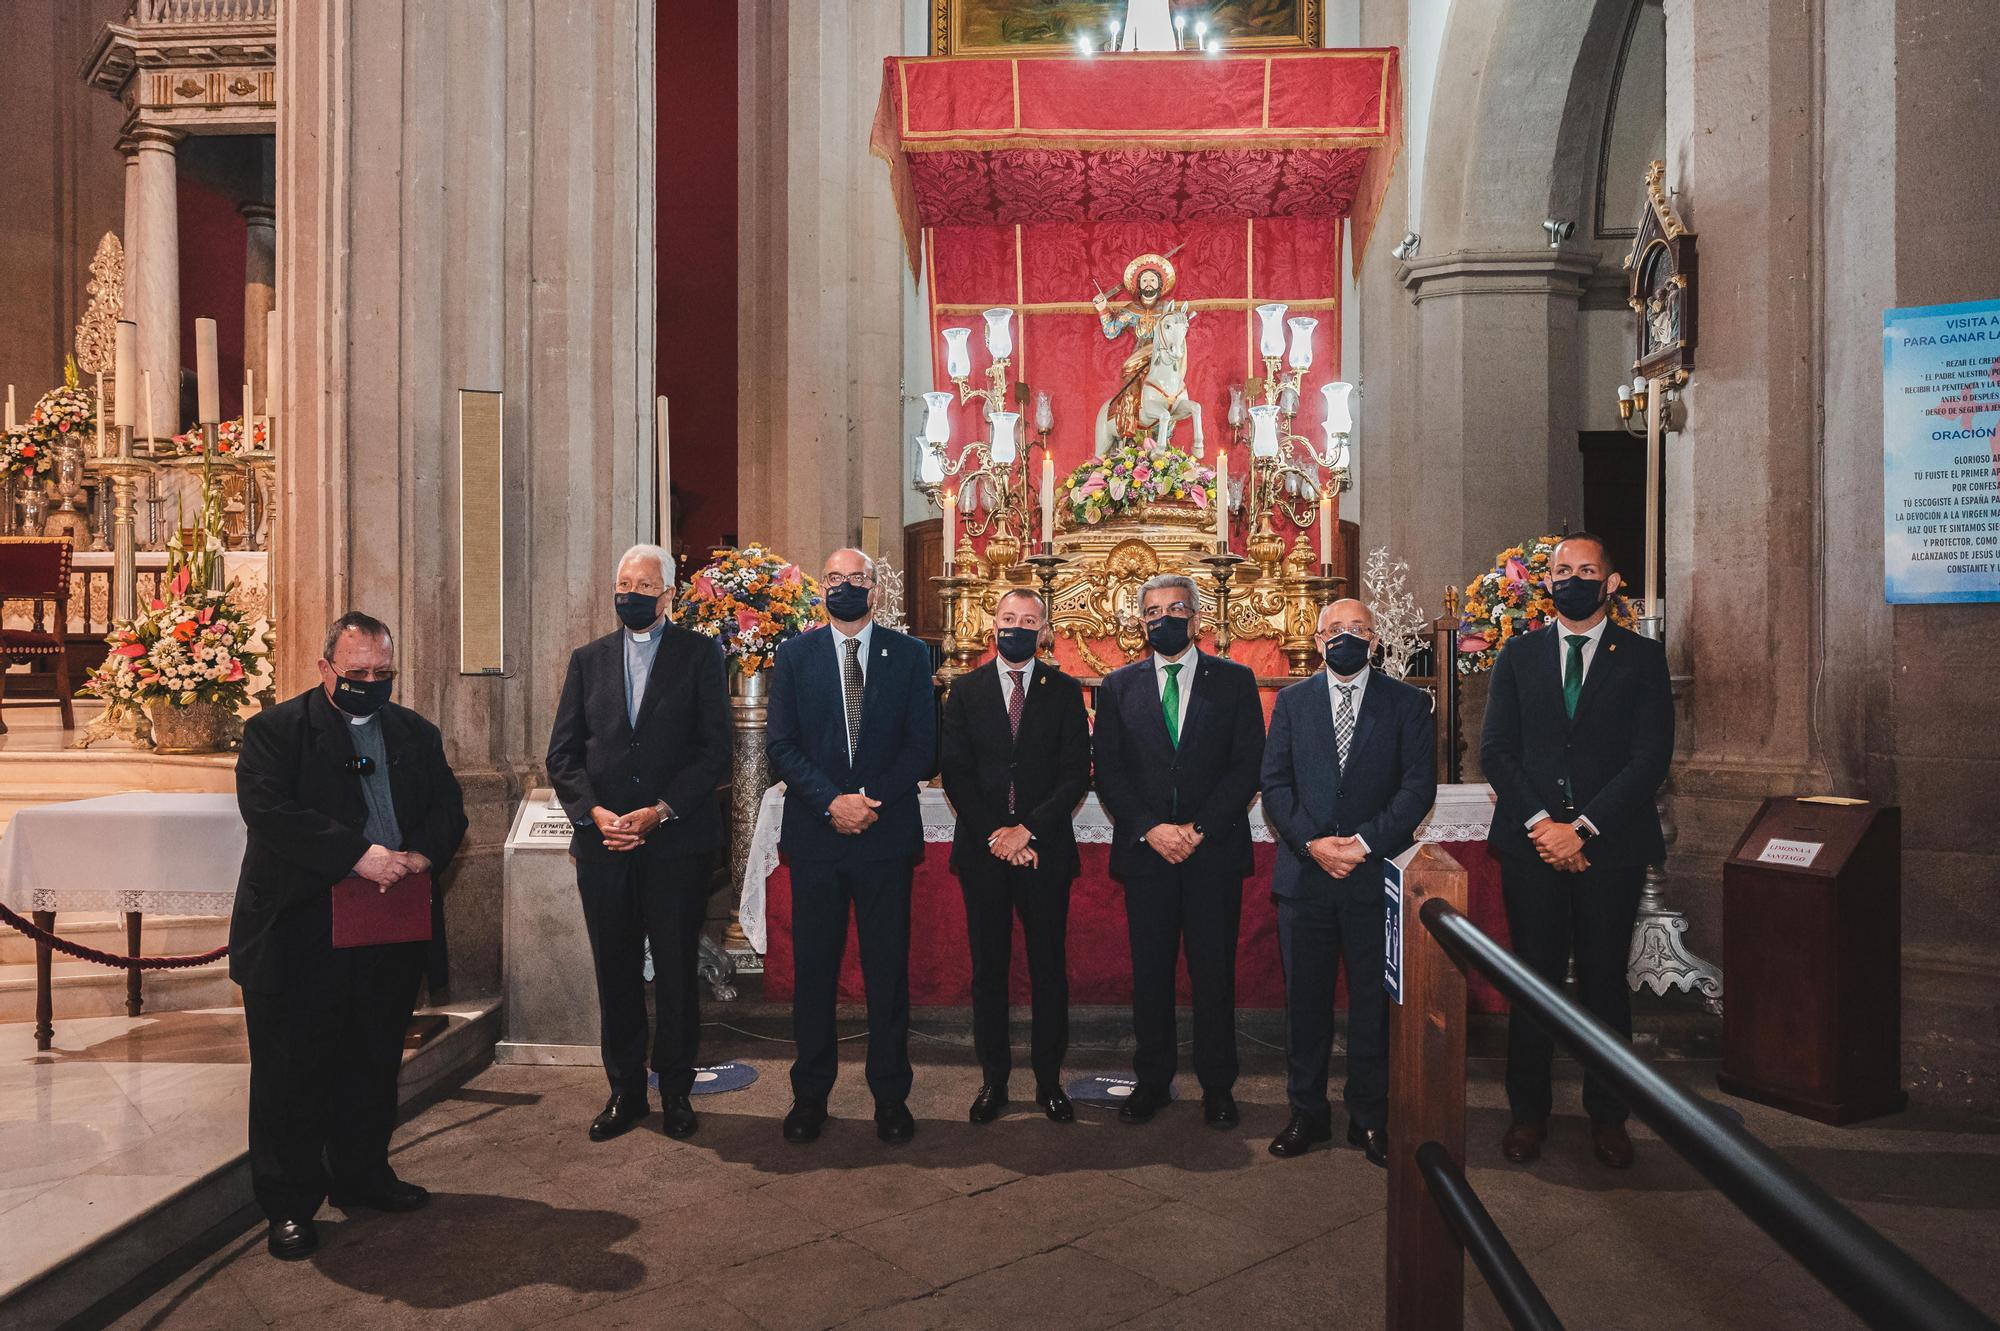 Constituído el Comité de Honor del Año Jacobeo